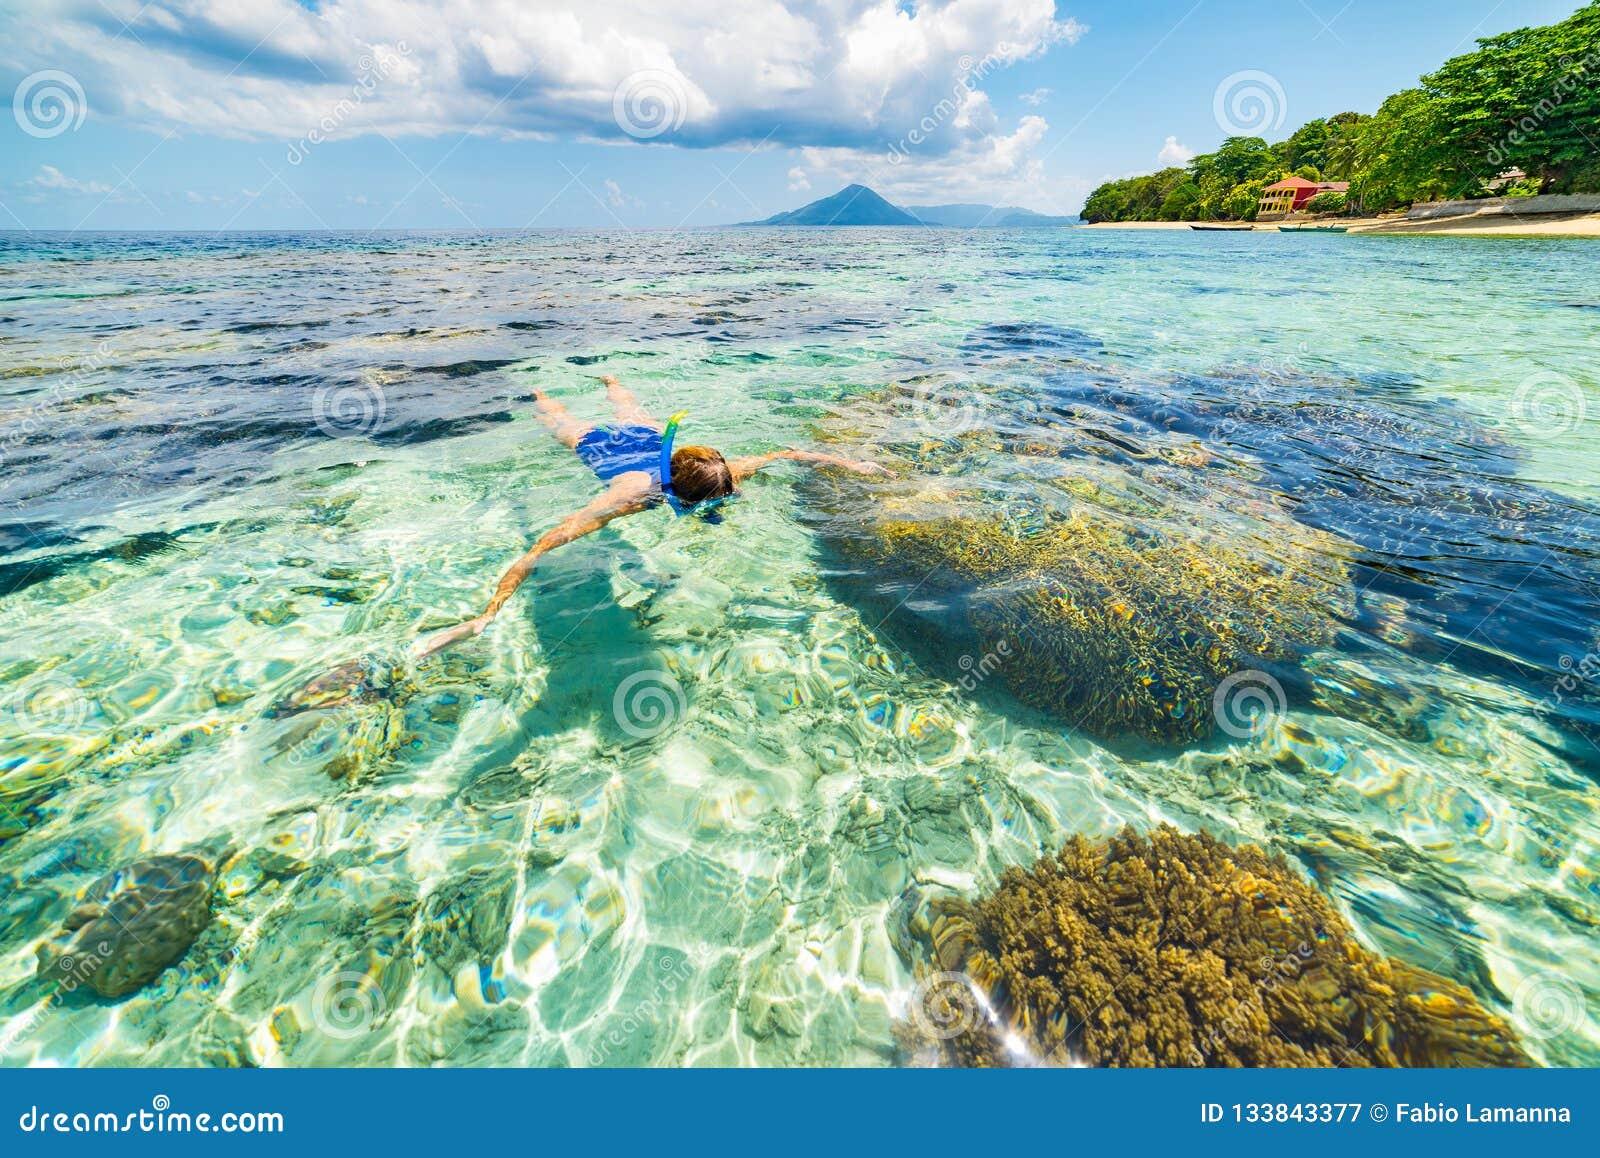 Woman snorkeling on coral reef tropical caribbean sea, turquoise blue water. Indonesia Banda archipelago, Moluccas Maluku, tourist